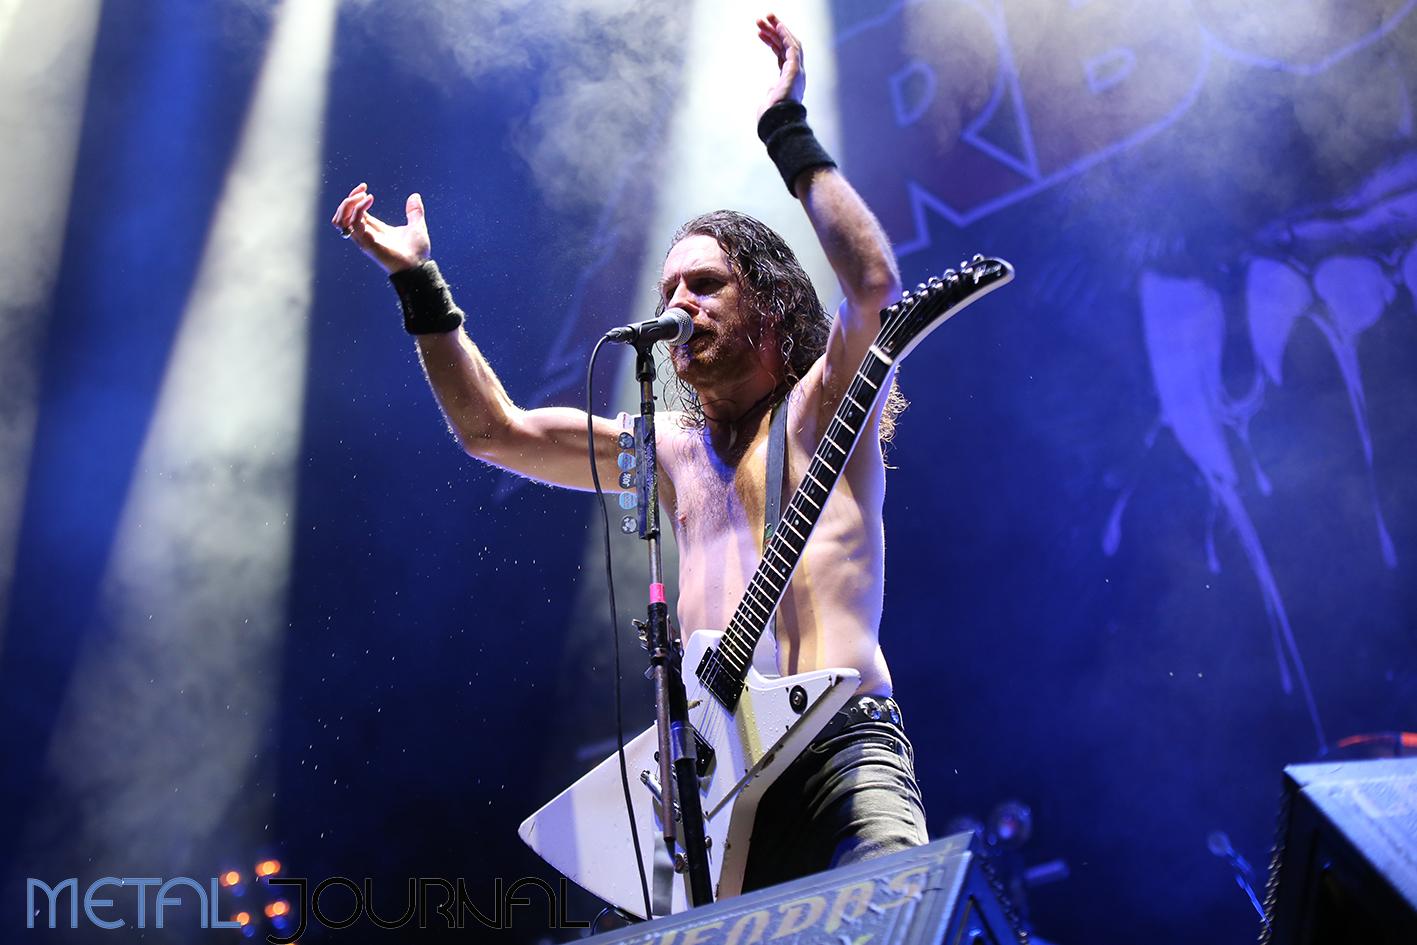 airbourne - leyendas del rock 2019 metal journal pic 14